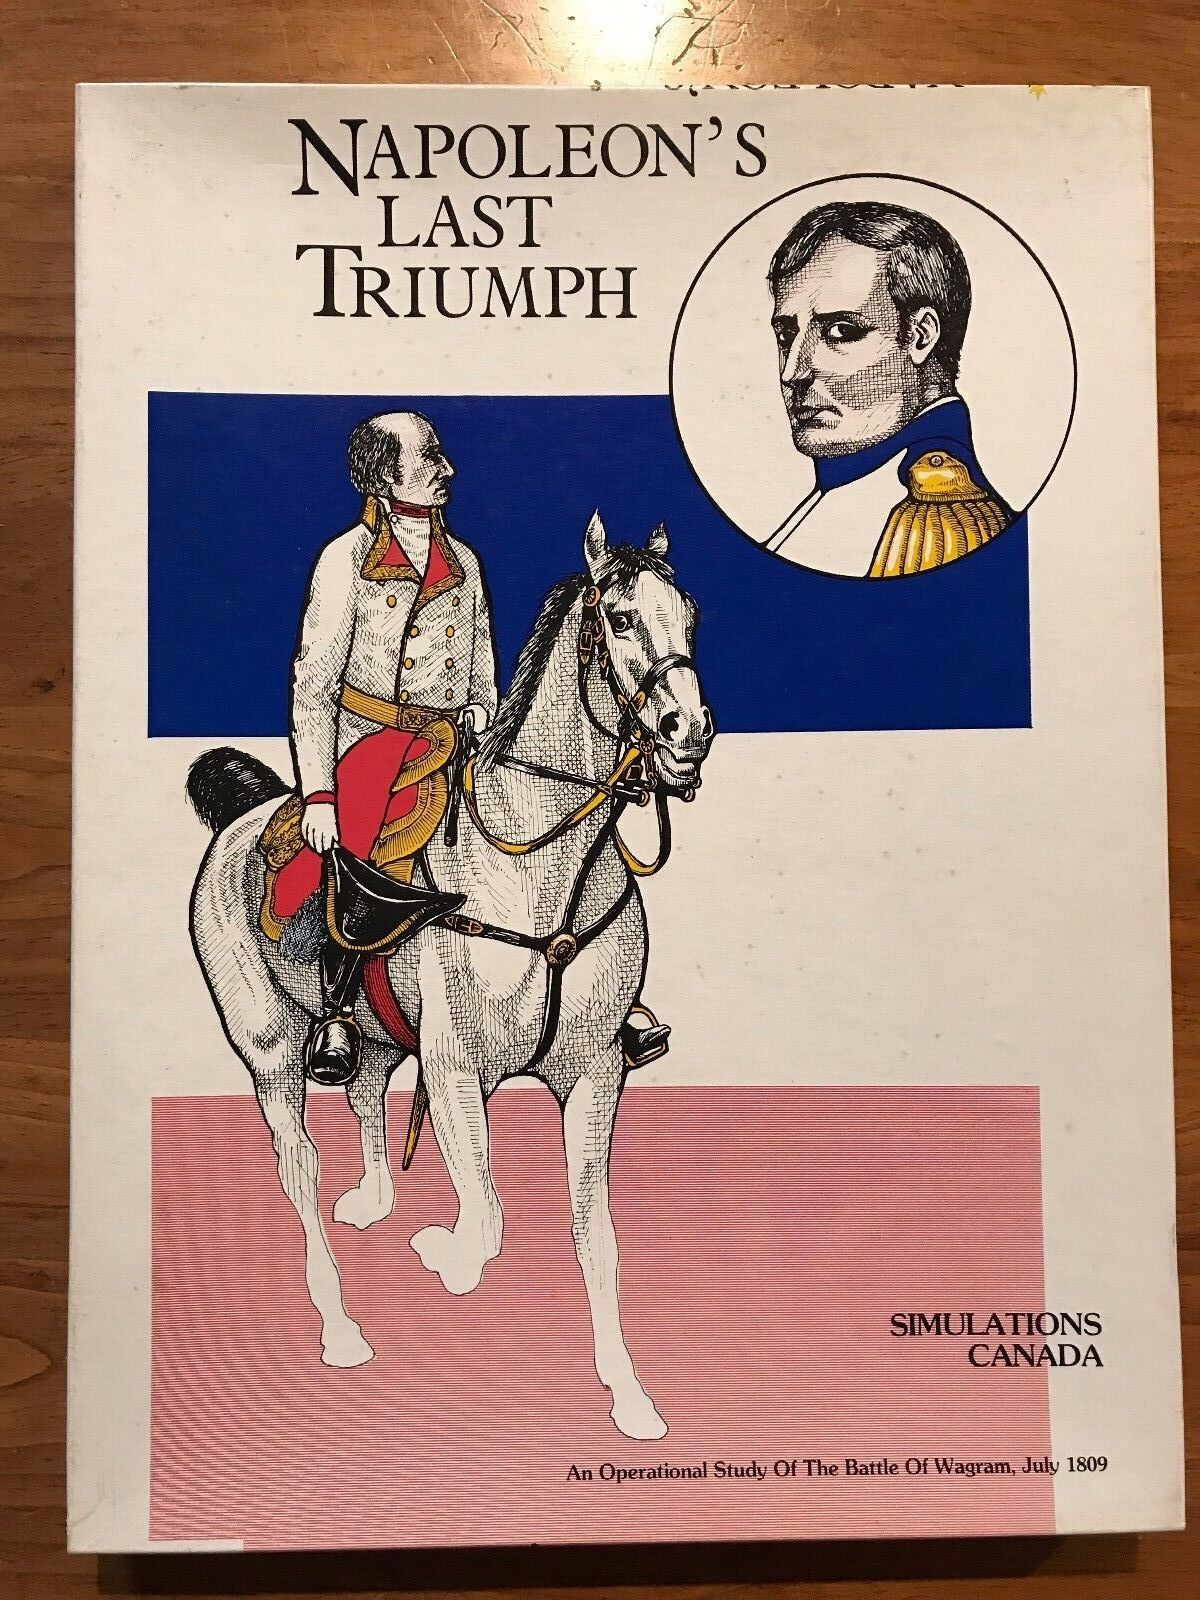 Napoleons letzte triumph - simulationen kanada - unpunched lohnt